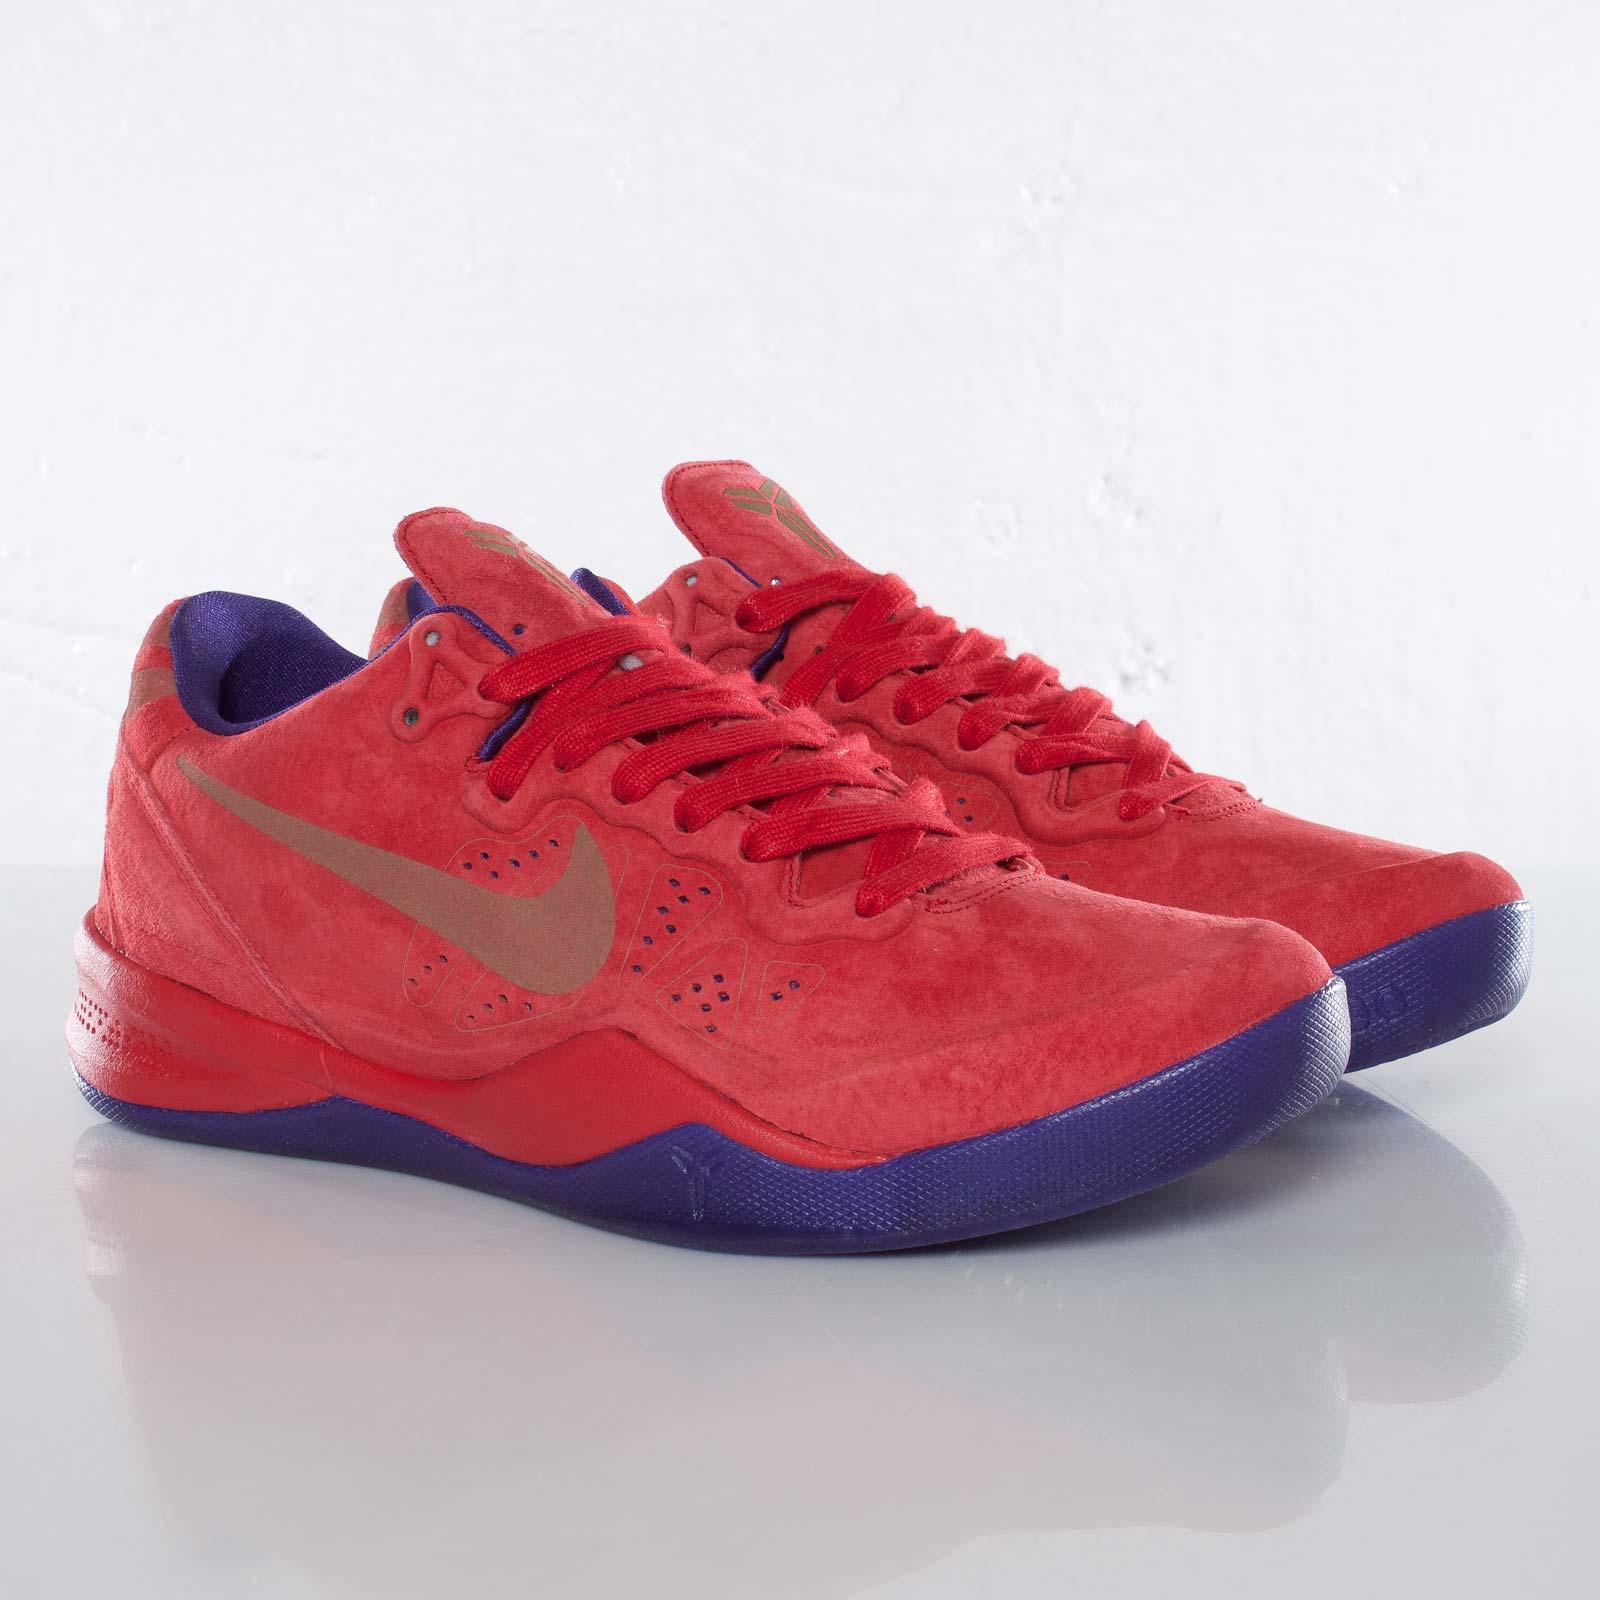 ab7ebd2ea2d6 Nike Zoom Kobe 8 EXT - 582554-600 - Sneakersnstuff